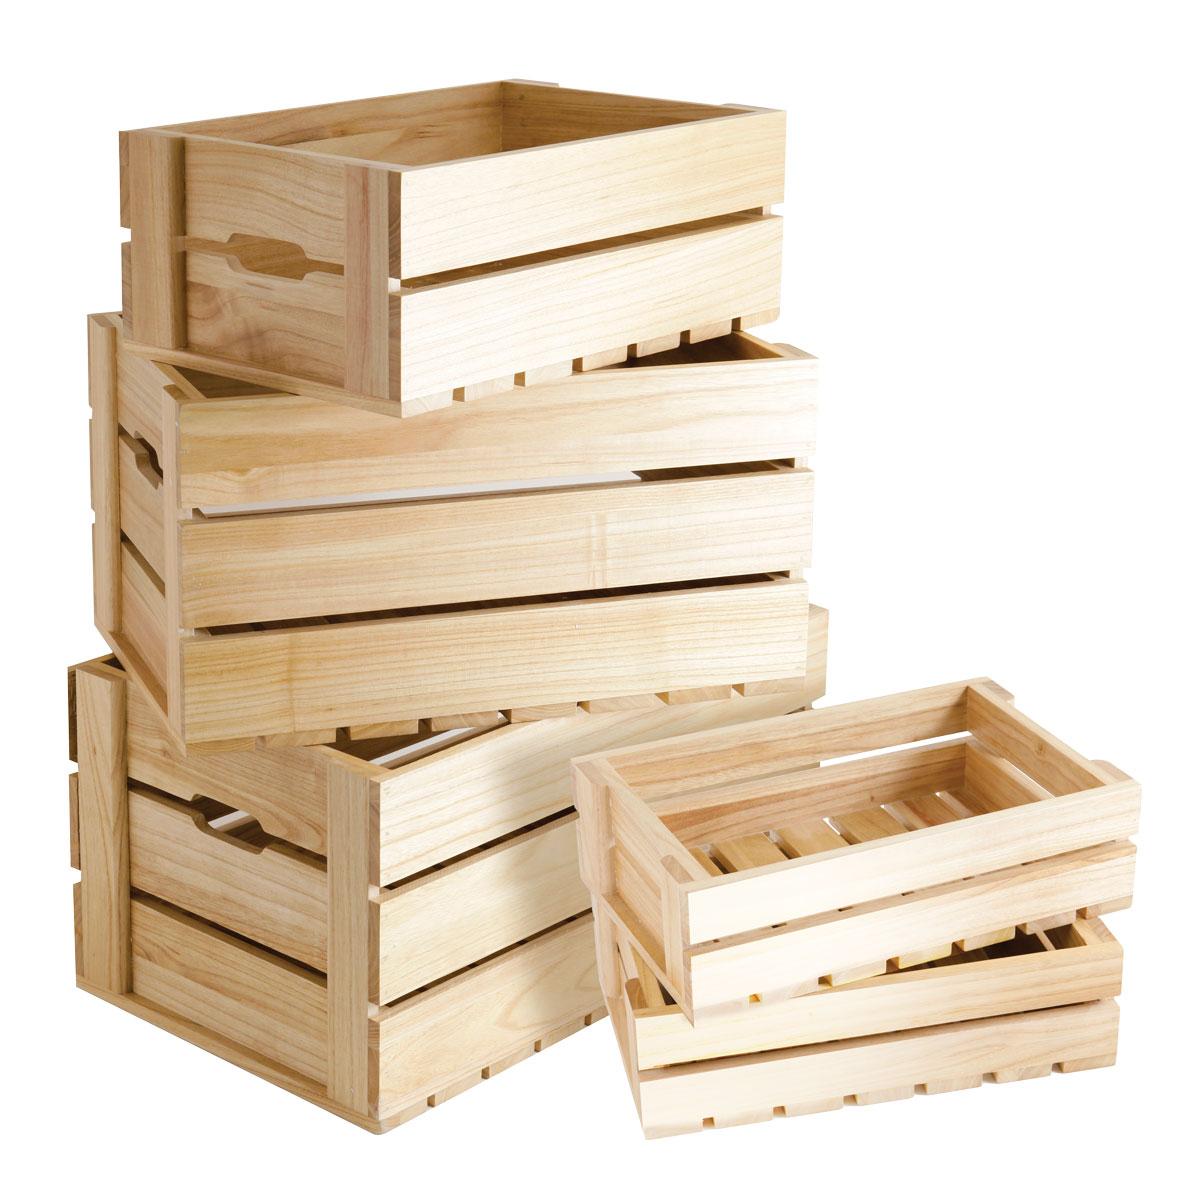 Ящик под овощи из дерева